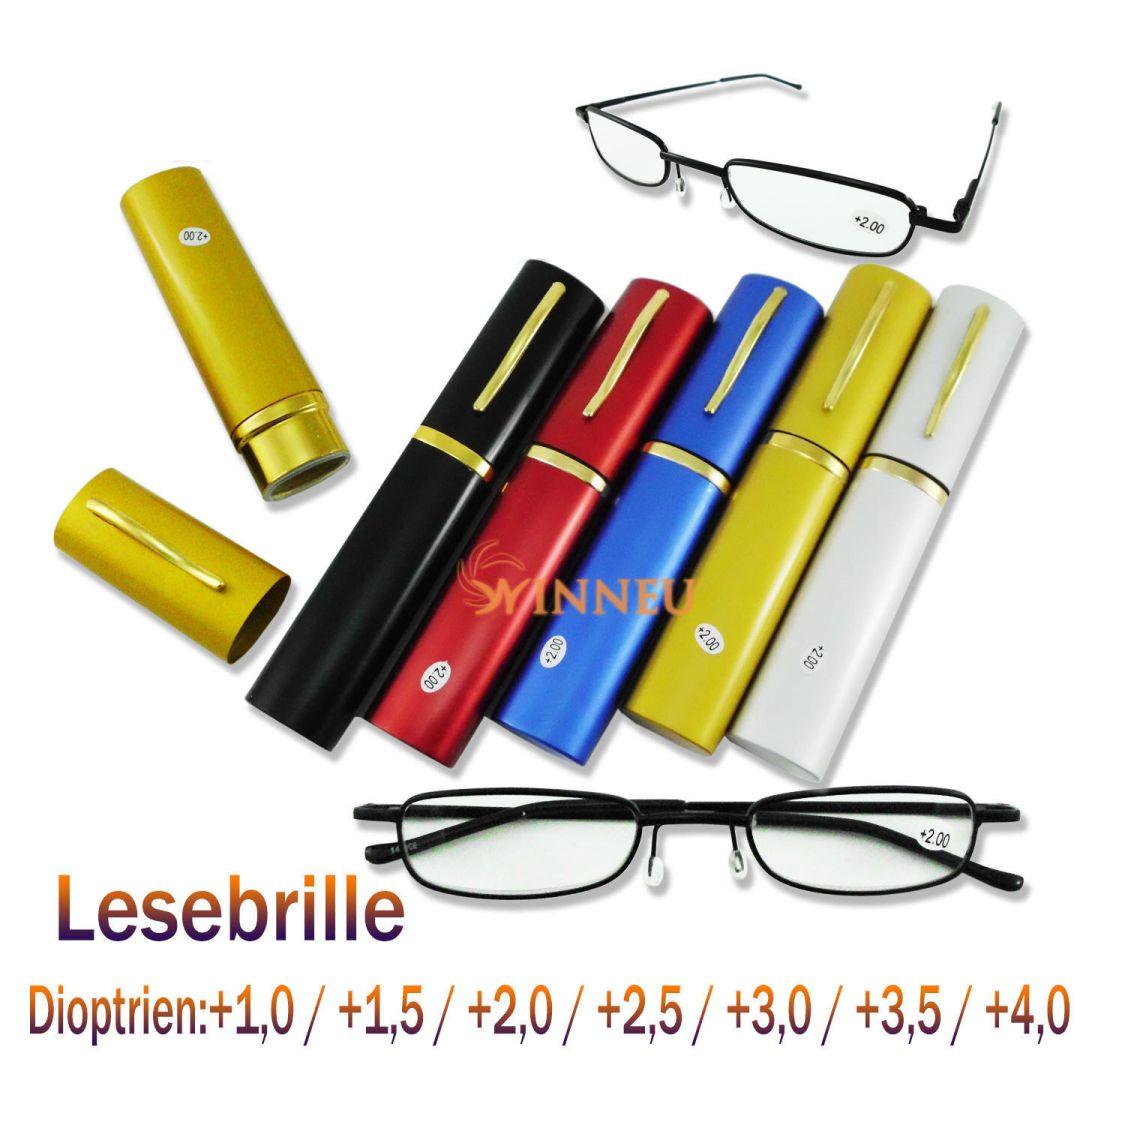 Lesebrille Lesebrillen Brille Lesehilfe Sehhilfe schwarz Metallgestell Alu Etui